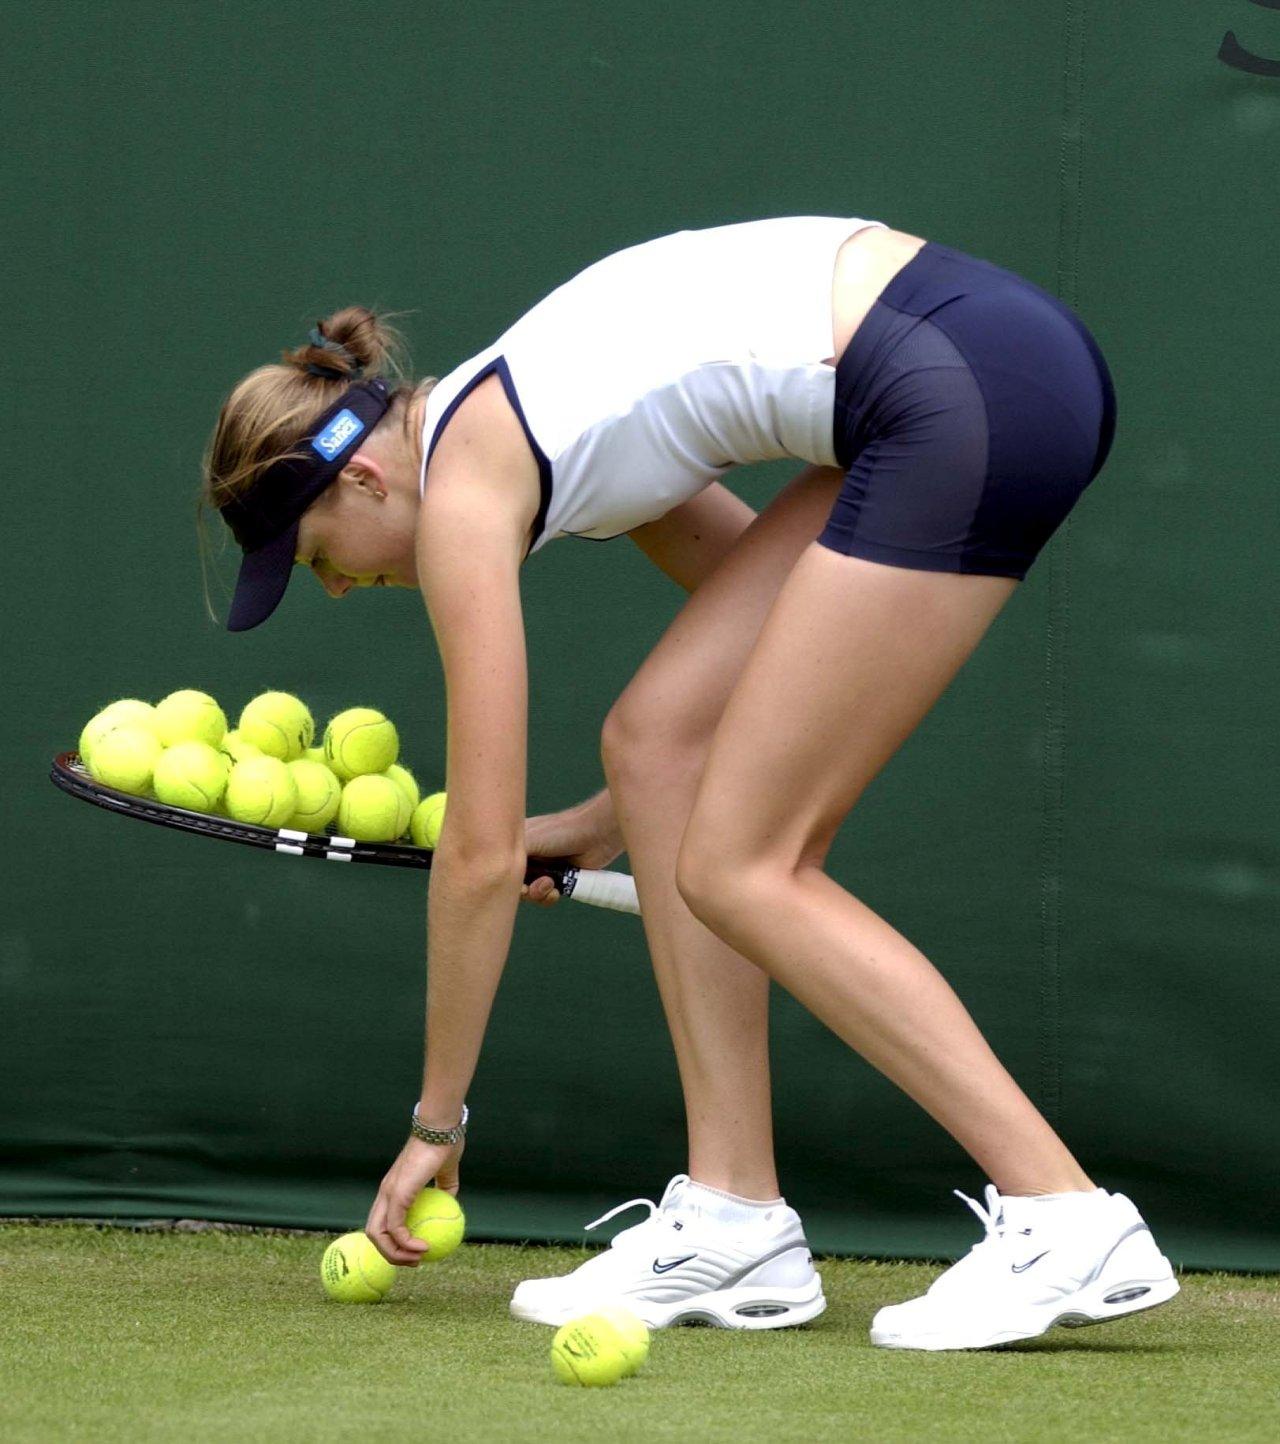 Best Sports Photos Of 2012: SPORTIGE: Daniela Hantuchova Hot Pics 2012